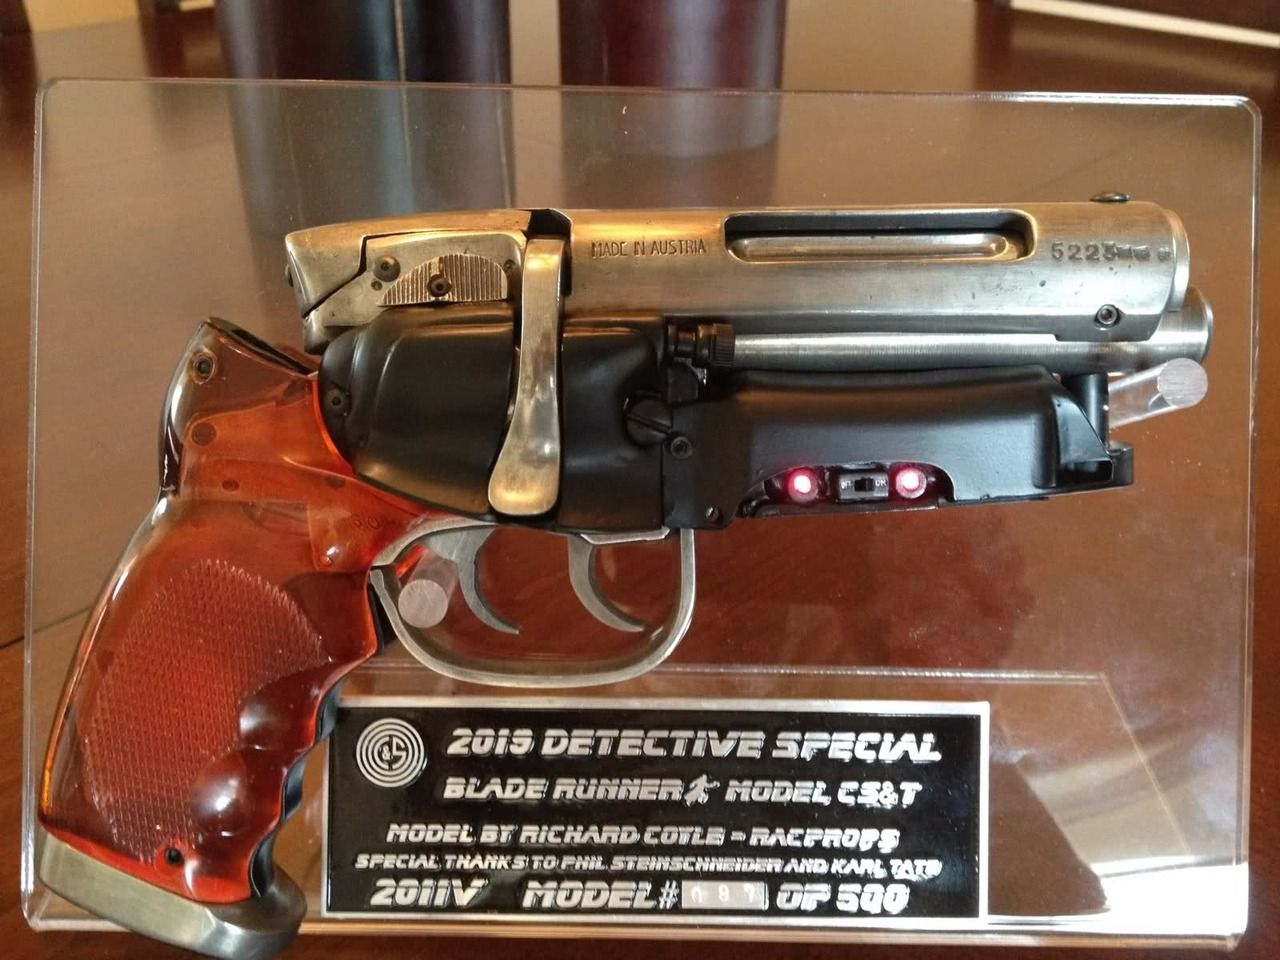 Blade runner pistol sf映画 ブレードランペーのまとめ 隃 昔のテレビ番組